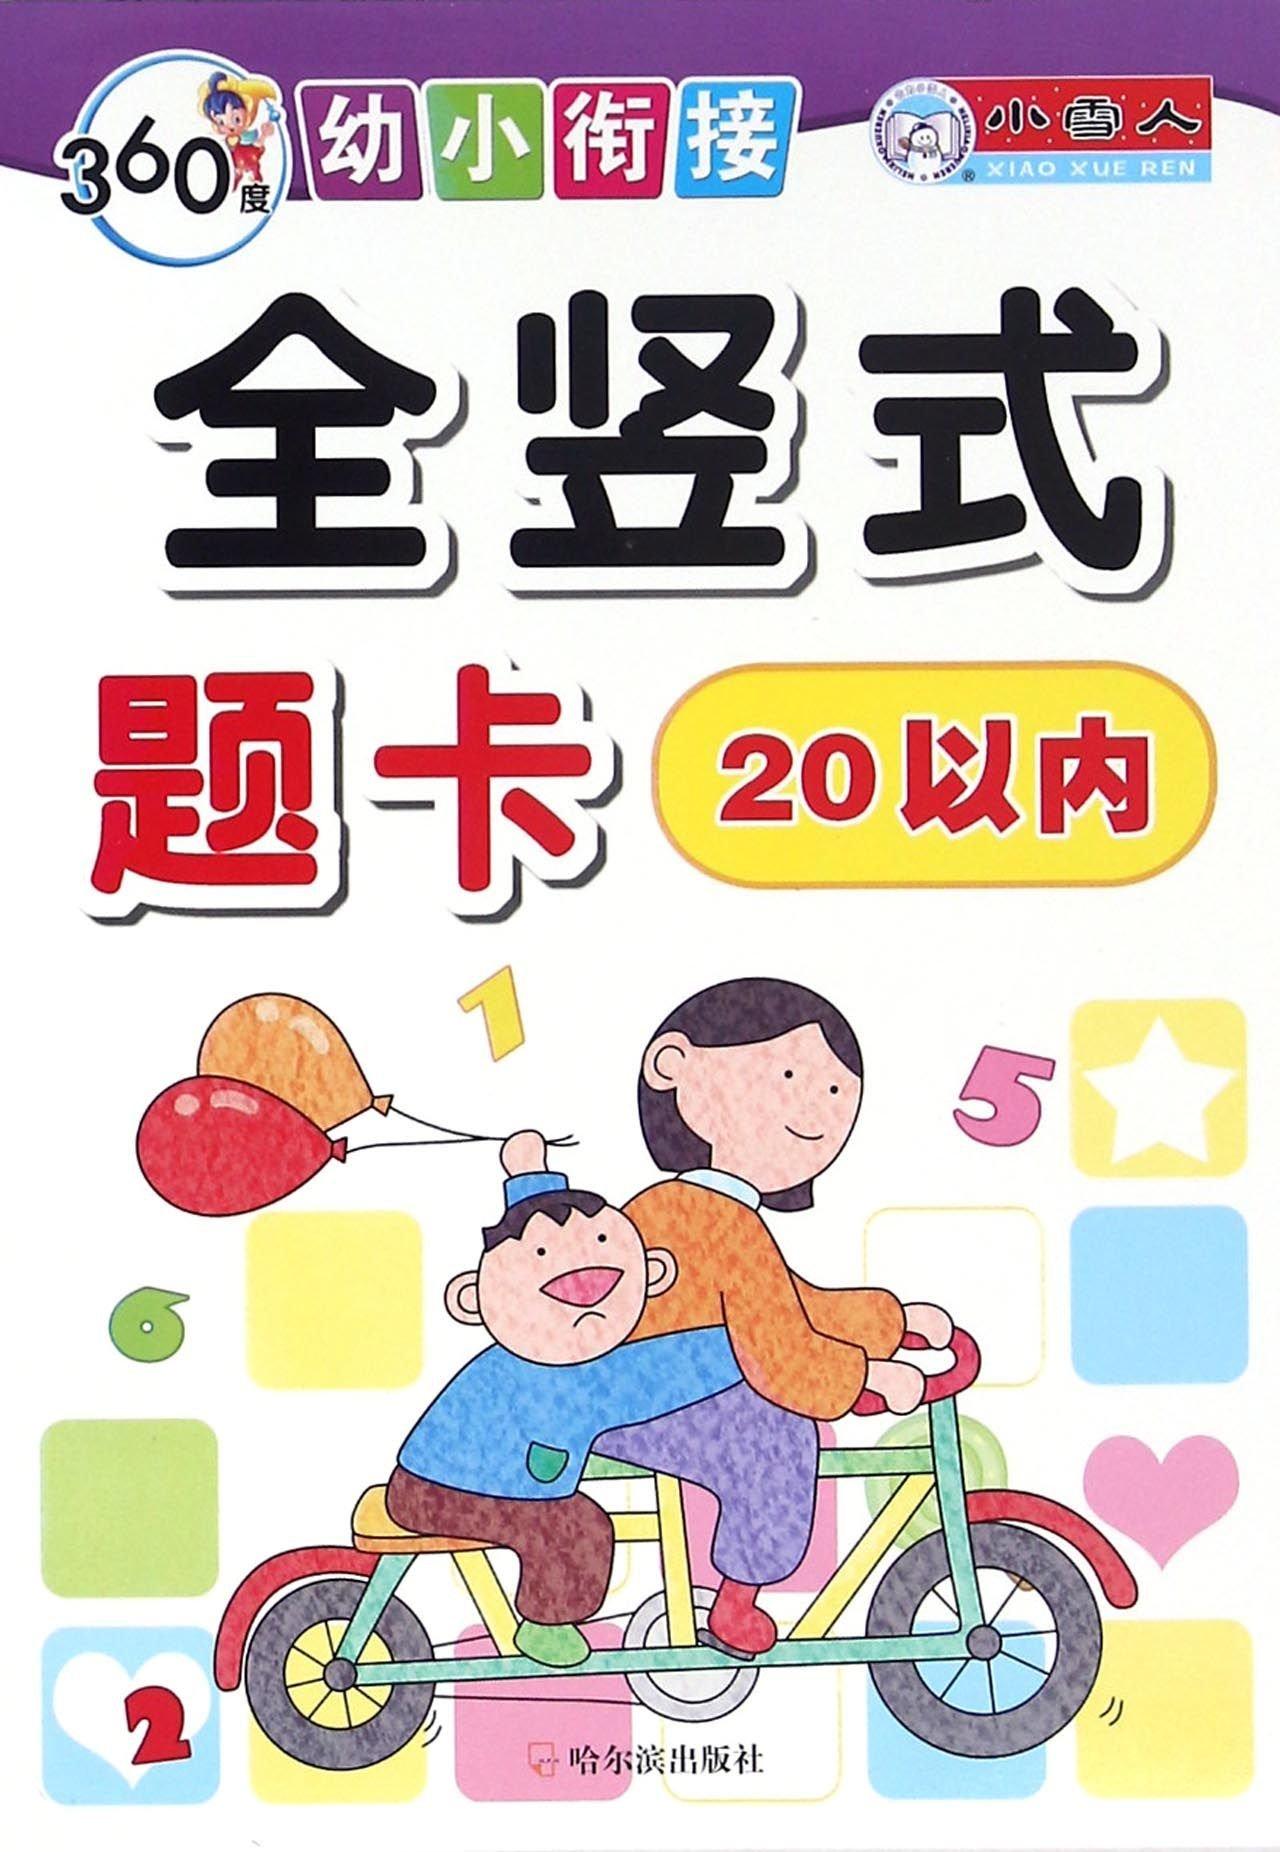 Read Online 全竖式题卡(20以内)/360度幼小衔接 pdf